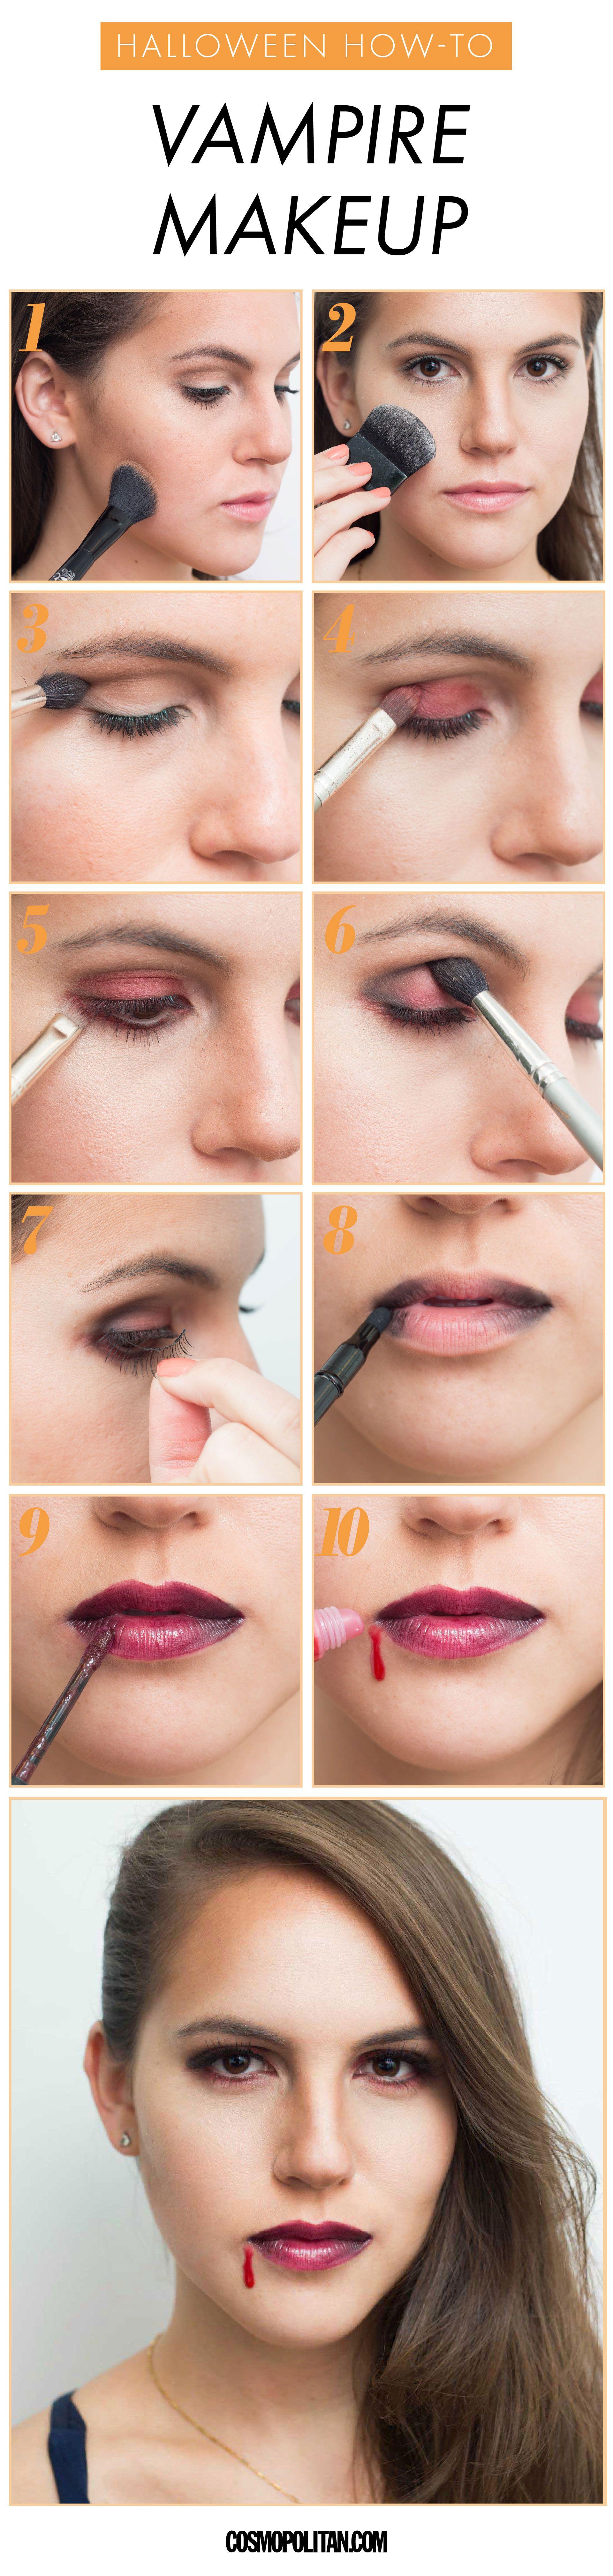 Vampire Makeup Tutorial for Halloween 2019 , How to Do